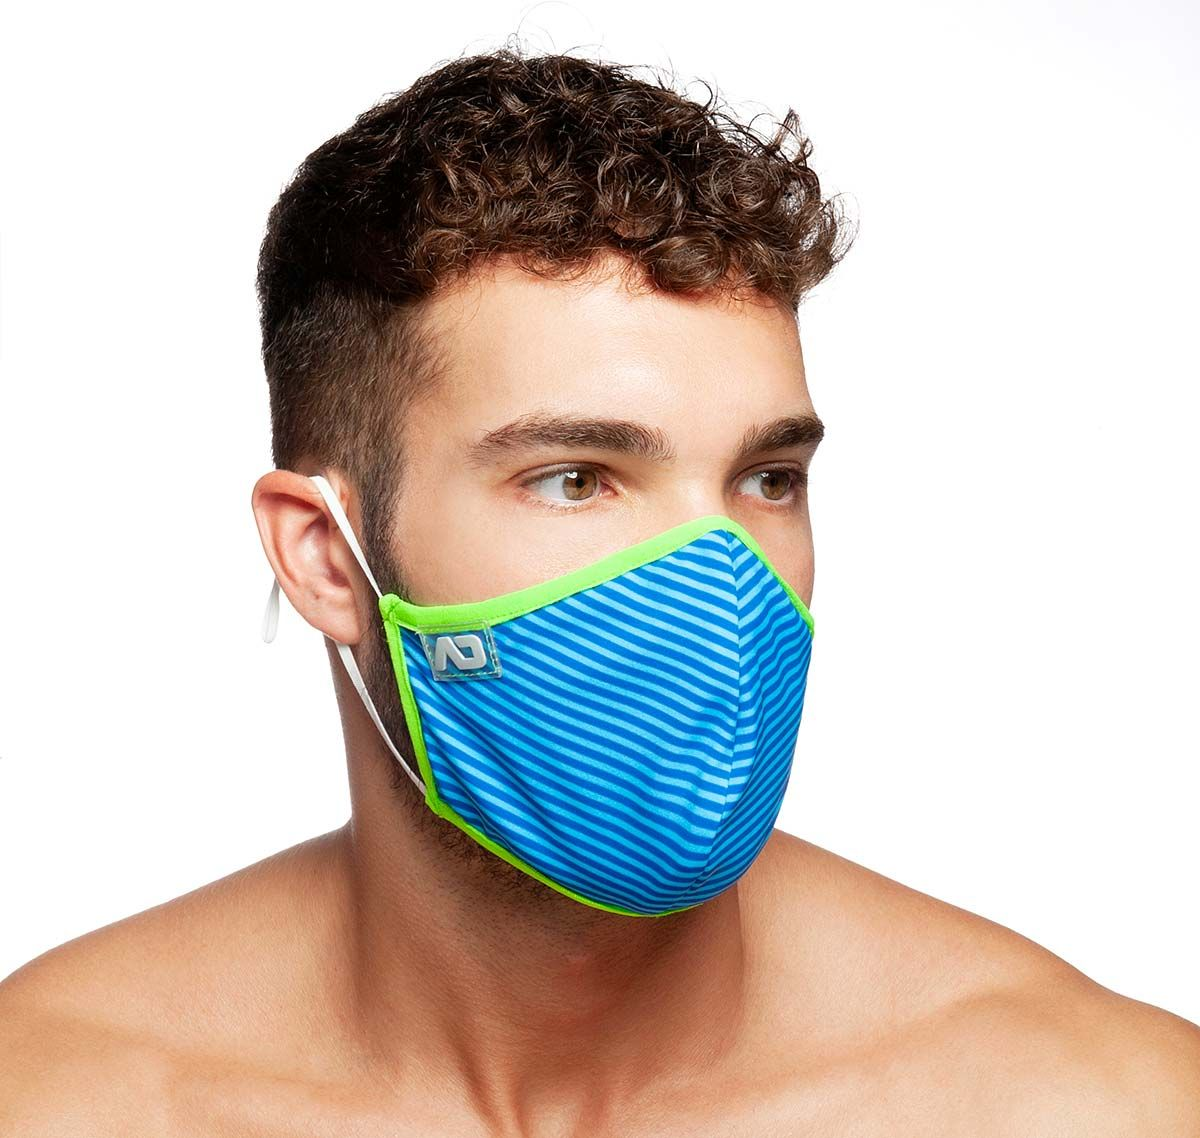 ADDICTED Masque facial STRIPES COMBI MASK AC115, bleu royal